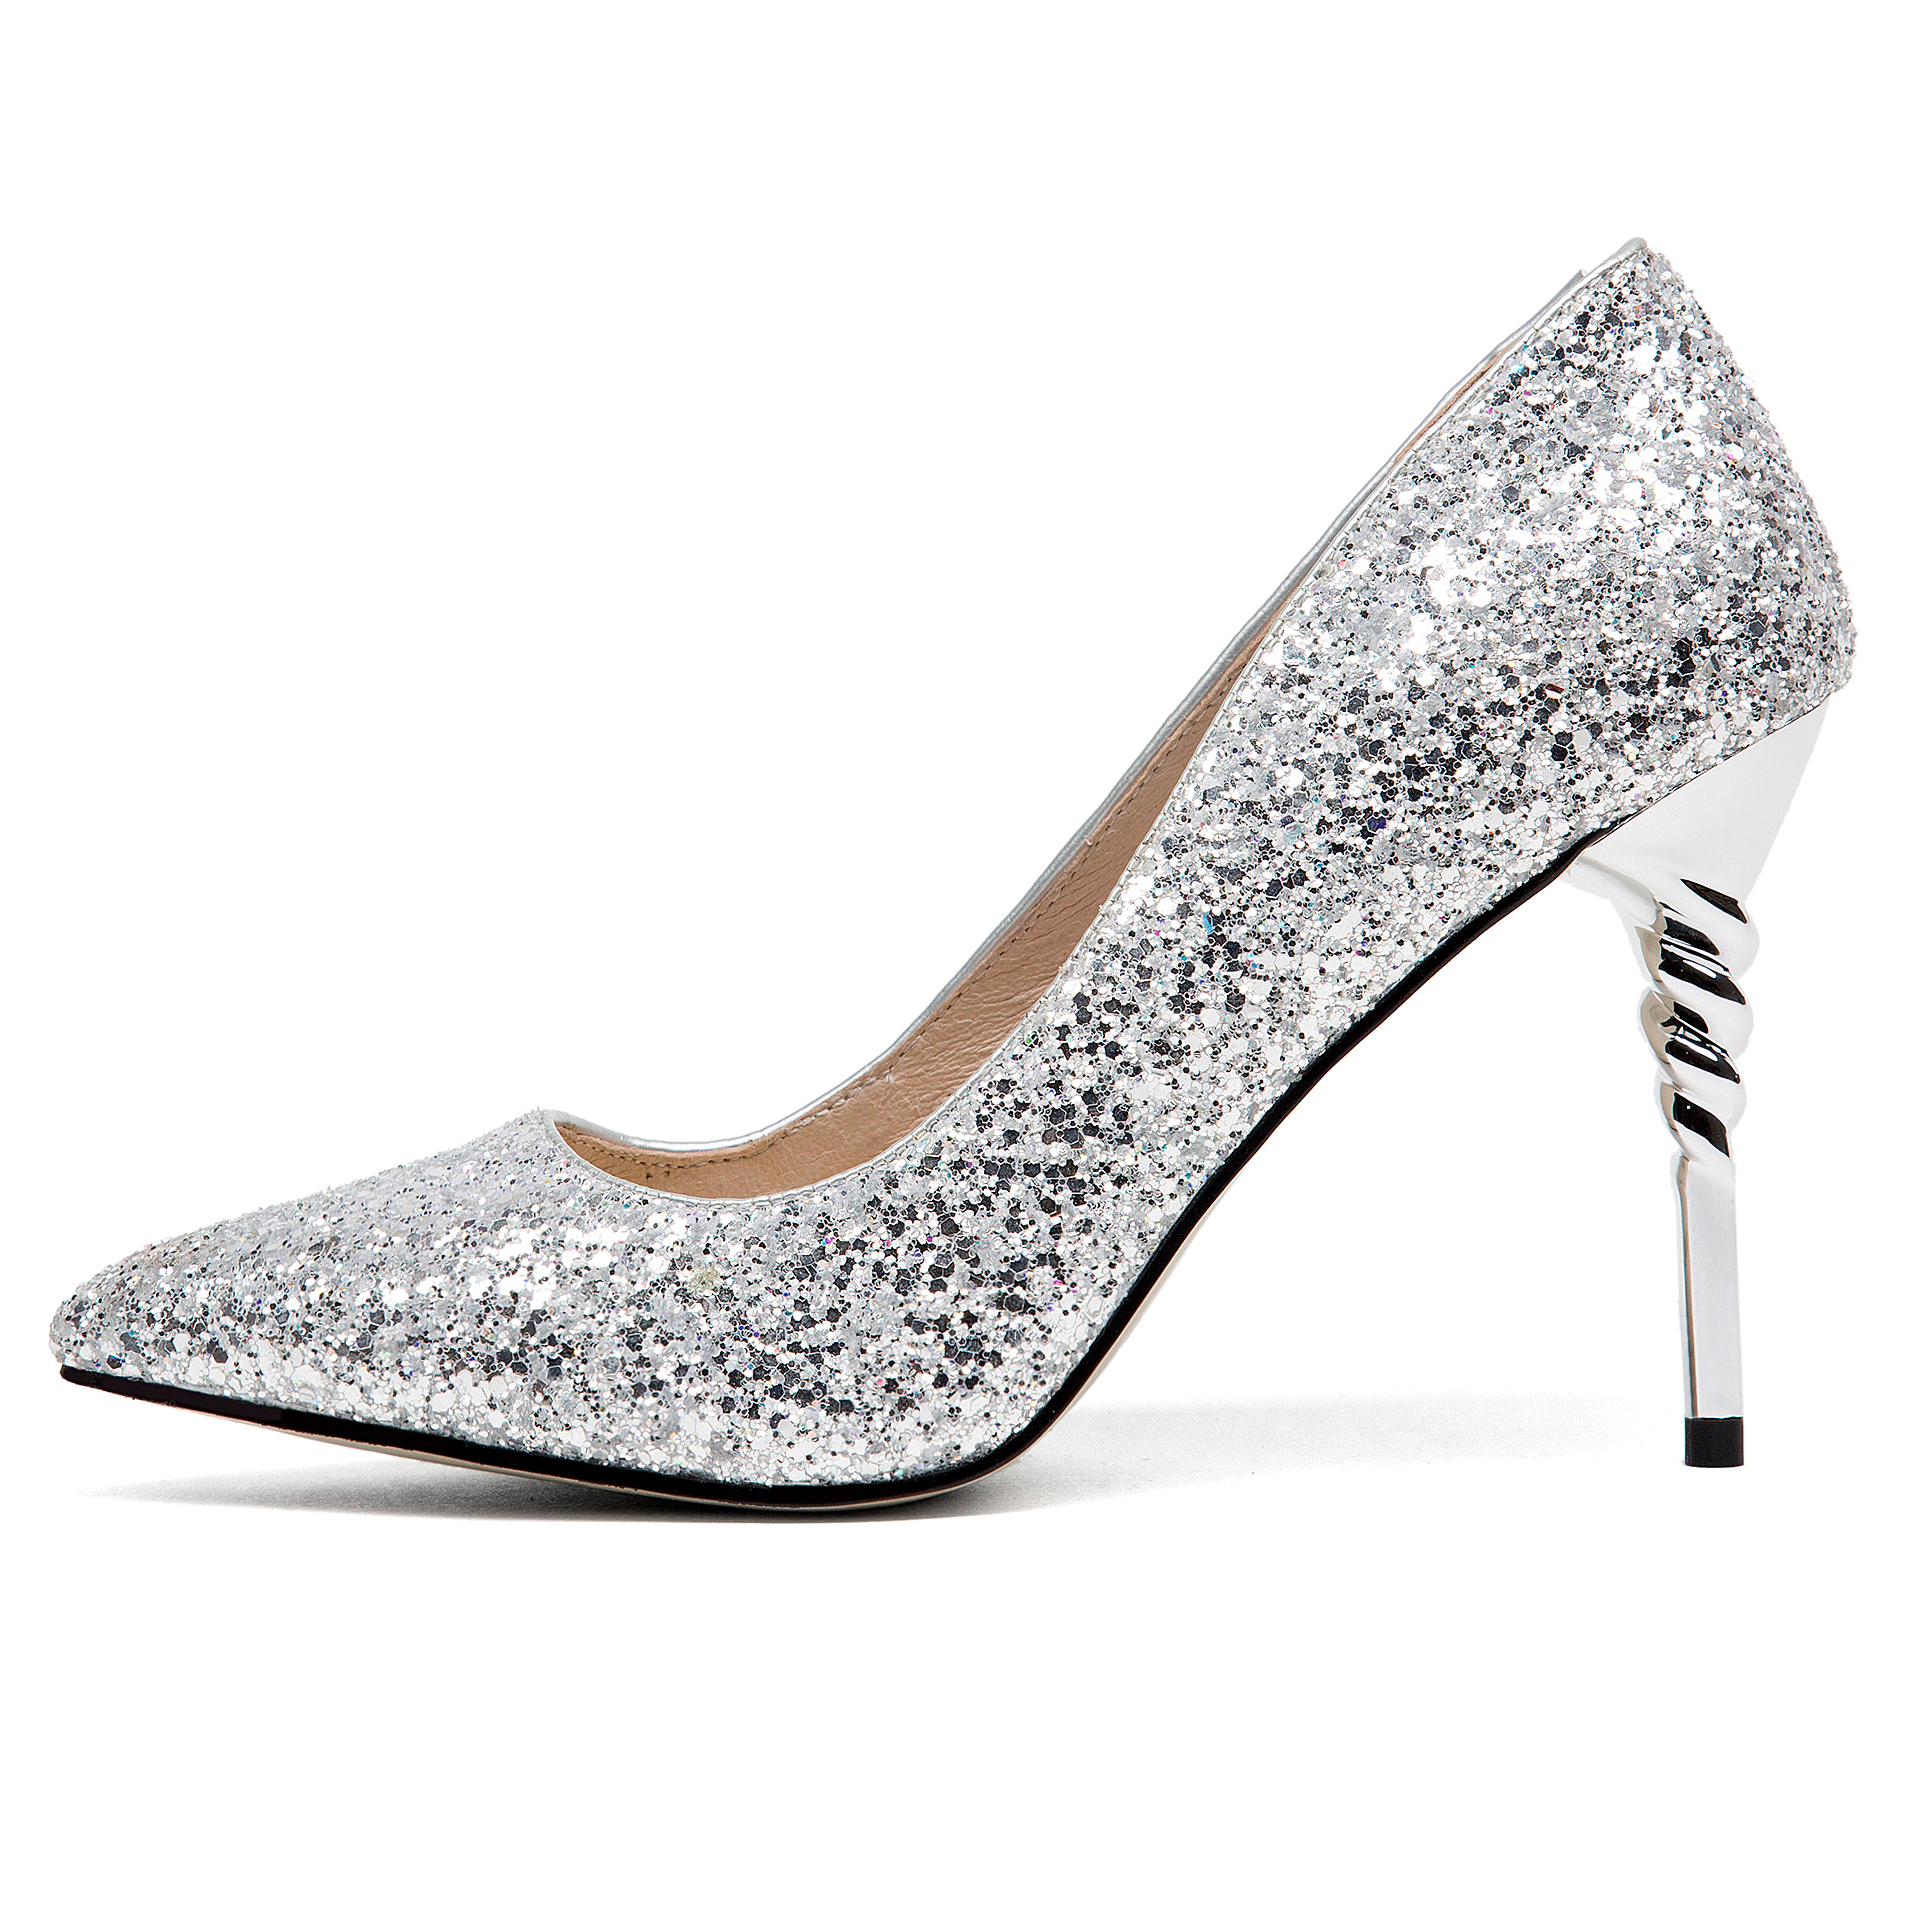 b6da82e14ec Arden Furtado 2018 new spring autumn fashion style sequined cloth shoes  woman high heels 9cm slip on pumps gold silver stilettos